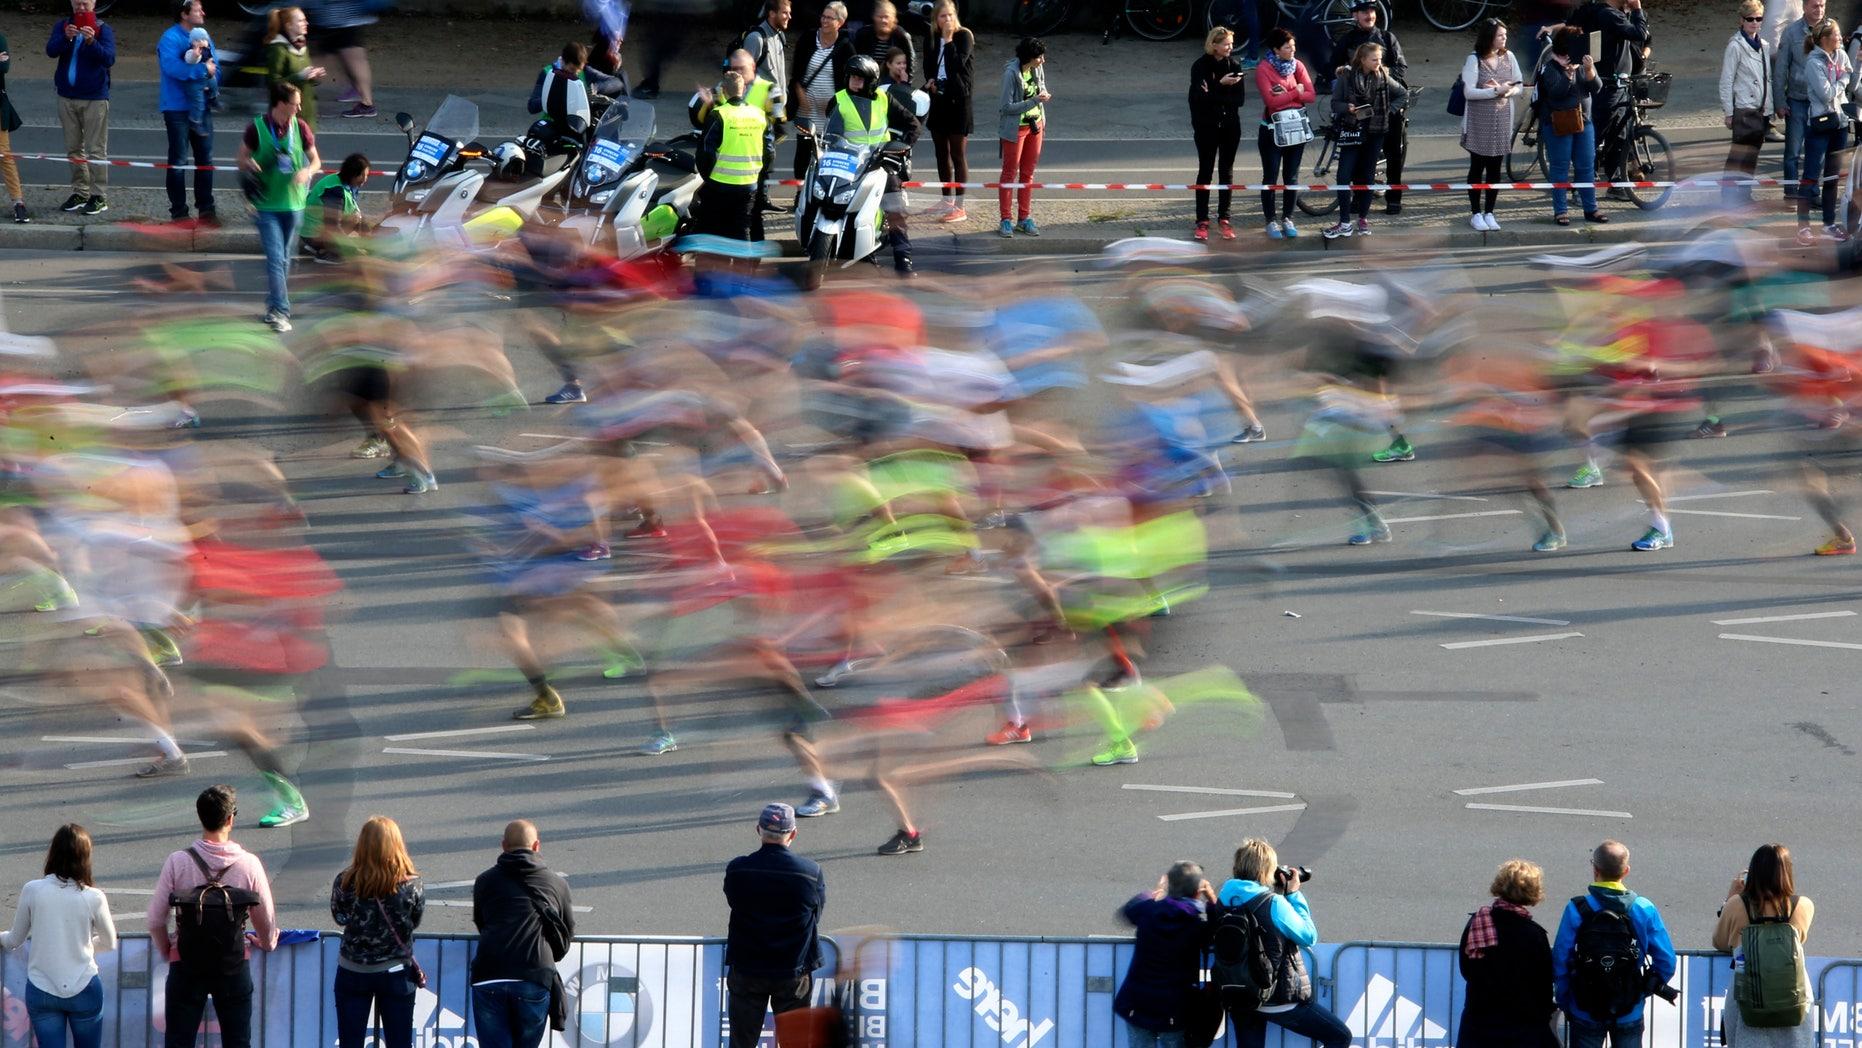 Runners compete at the Berlin marathon in Berlin, Germany, September 25, 2016. (REUTERS/Fabrizio Bensch)